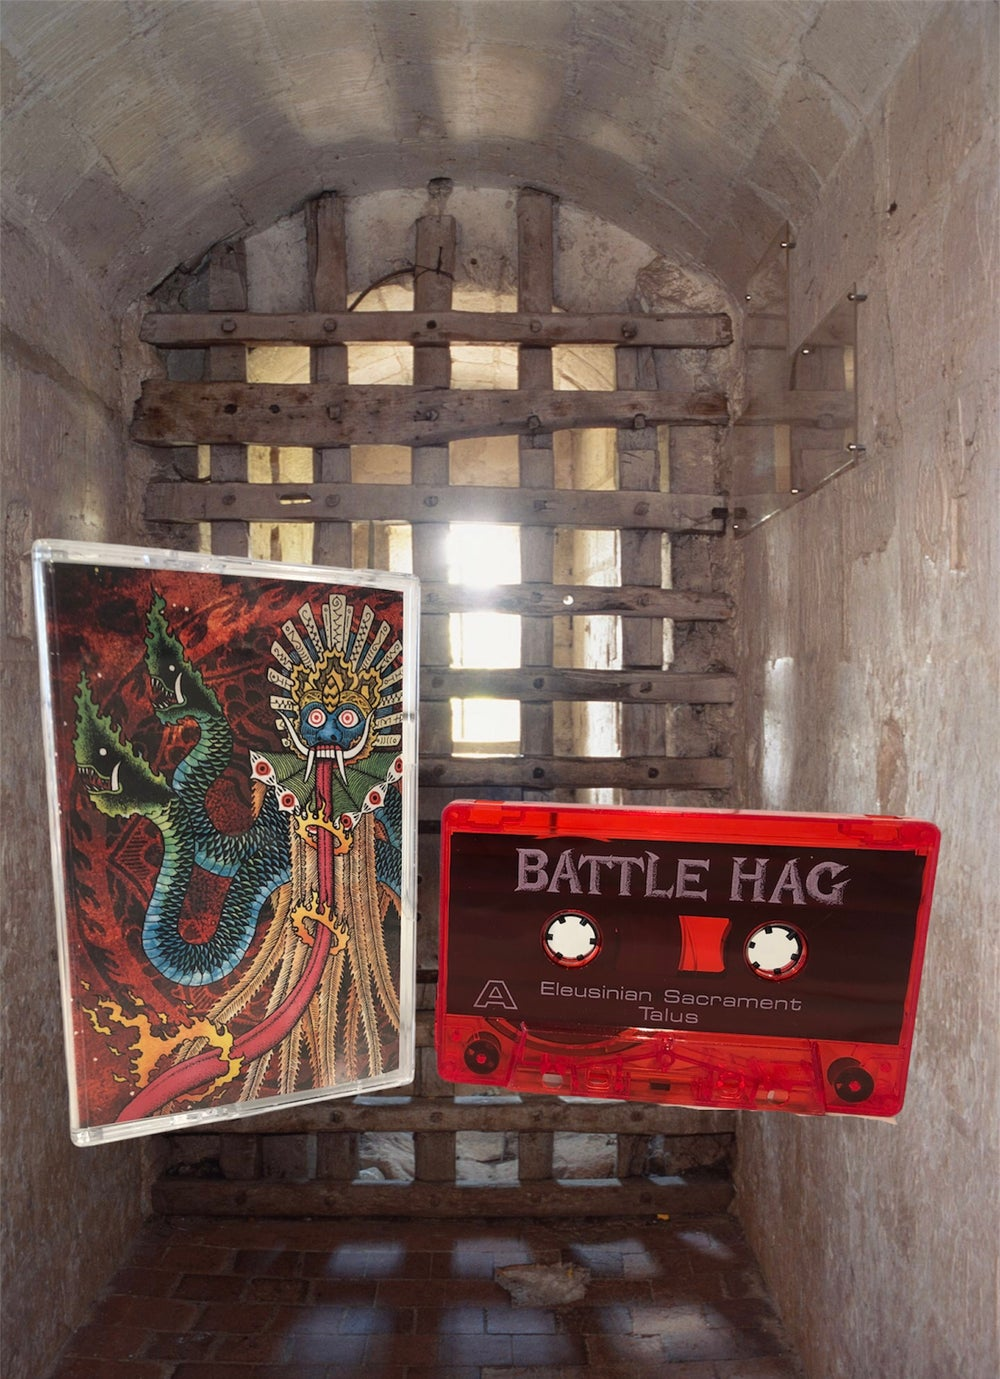 Image of Battle Hag - Celestial Tyrant